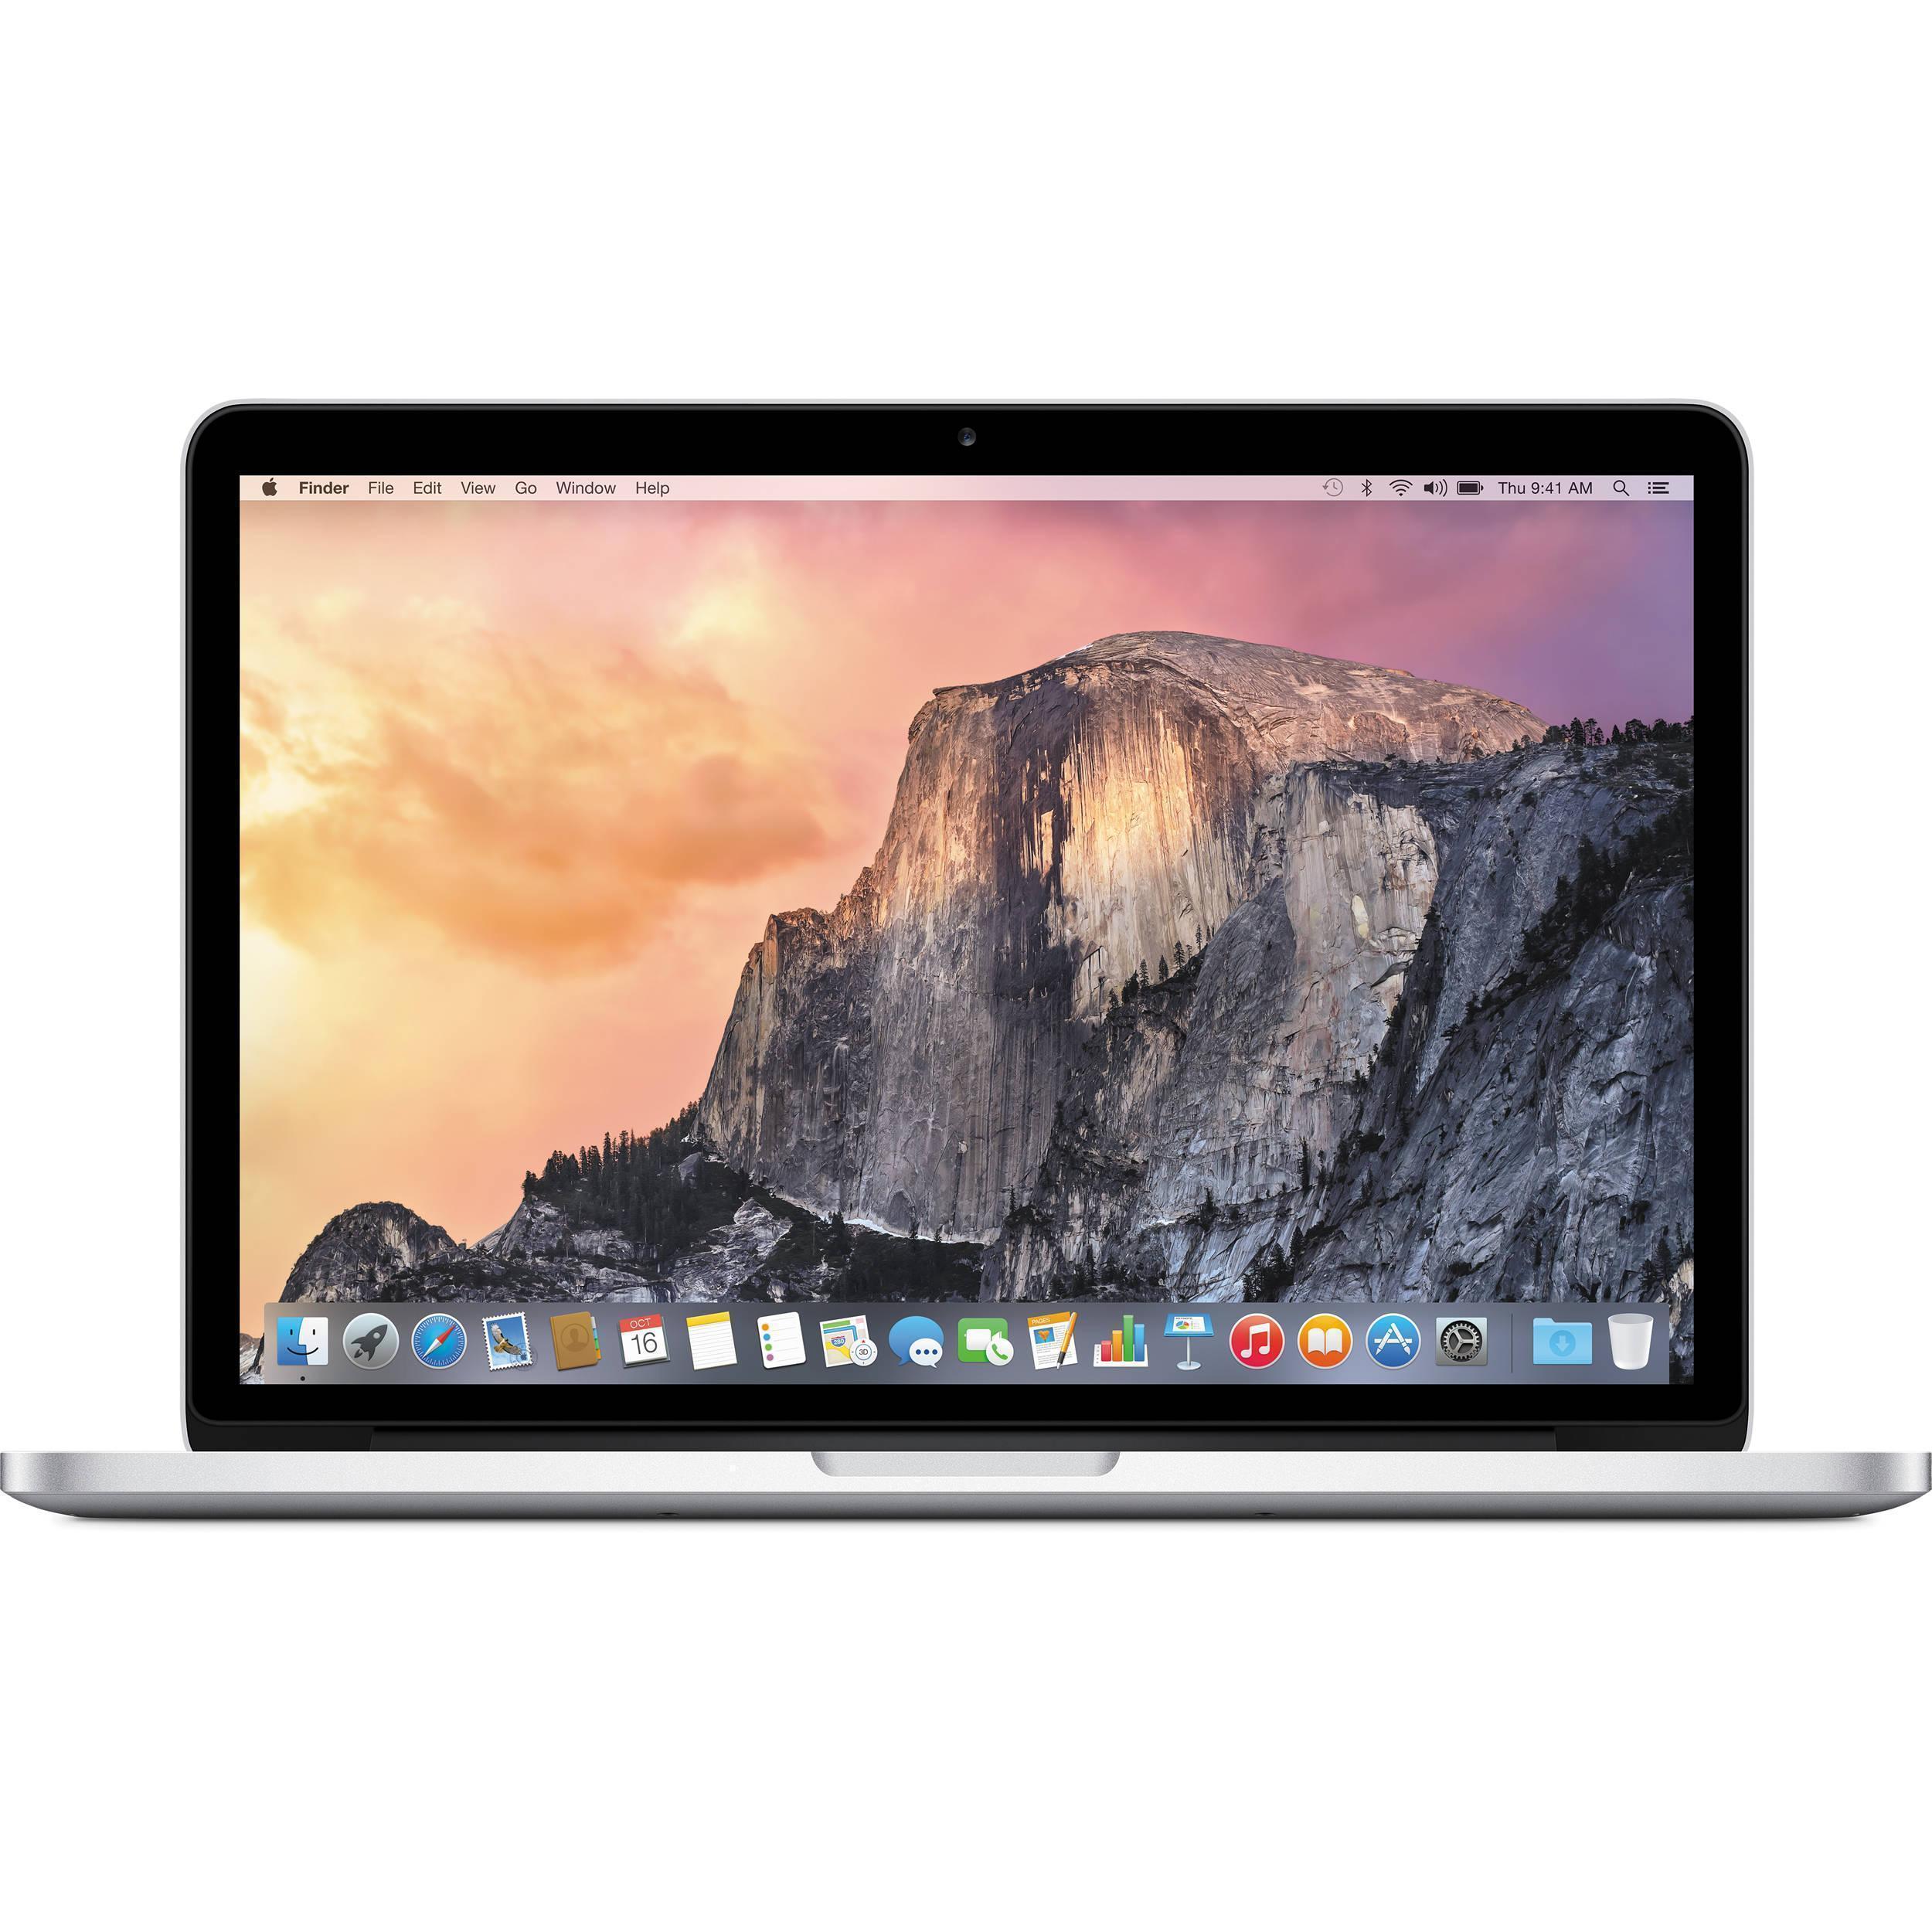 MacBook Pro Retina 13,3-inch (2015) - Core i5 - 8GB - SSD 256 GB QWERTY - Espanhol